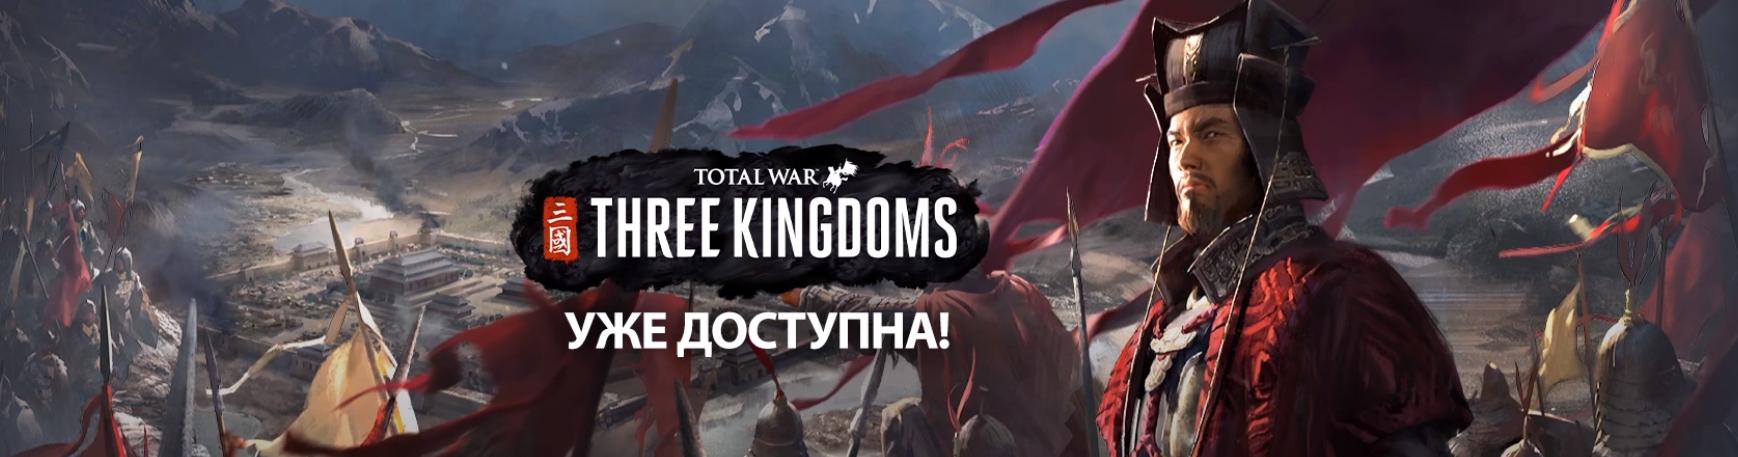 Total War: THREE KINGDOMS (Steam Gift Ru)